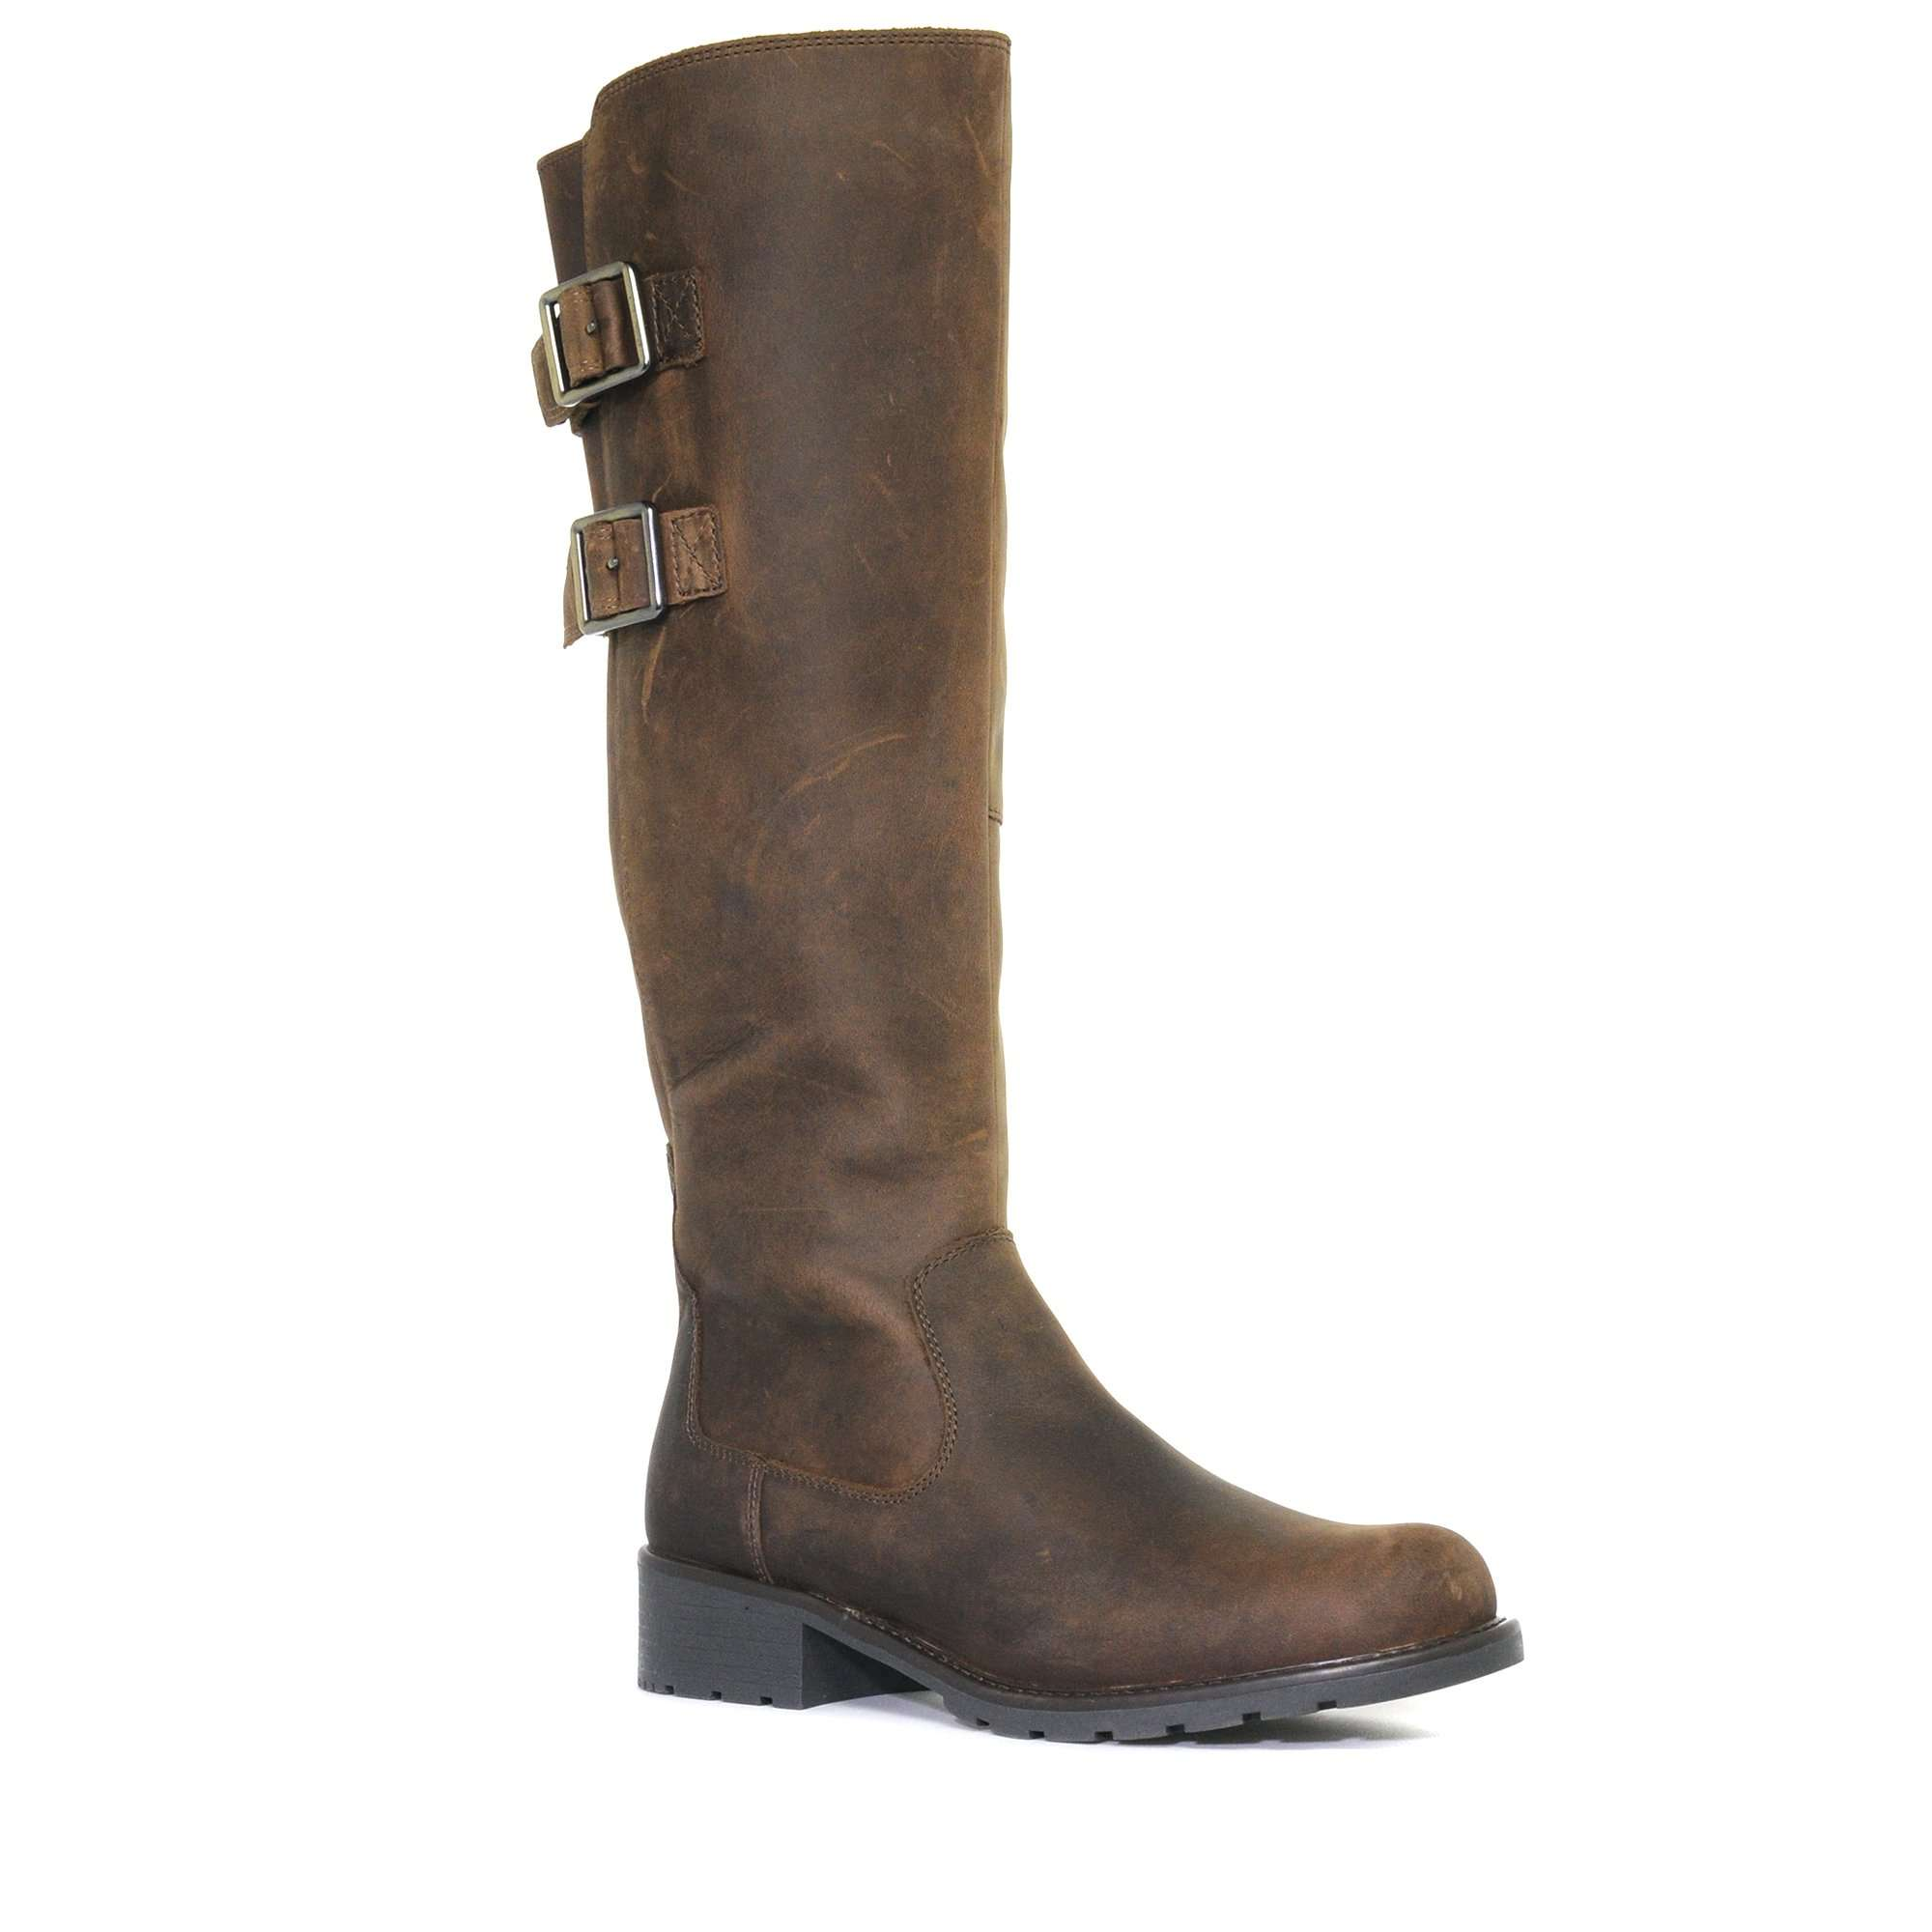 CLARKS Women's Orinoco Tango Boot